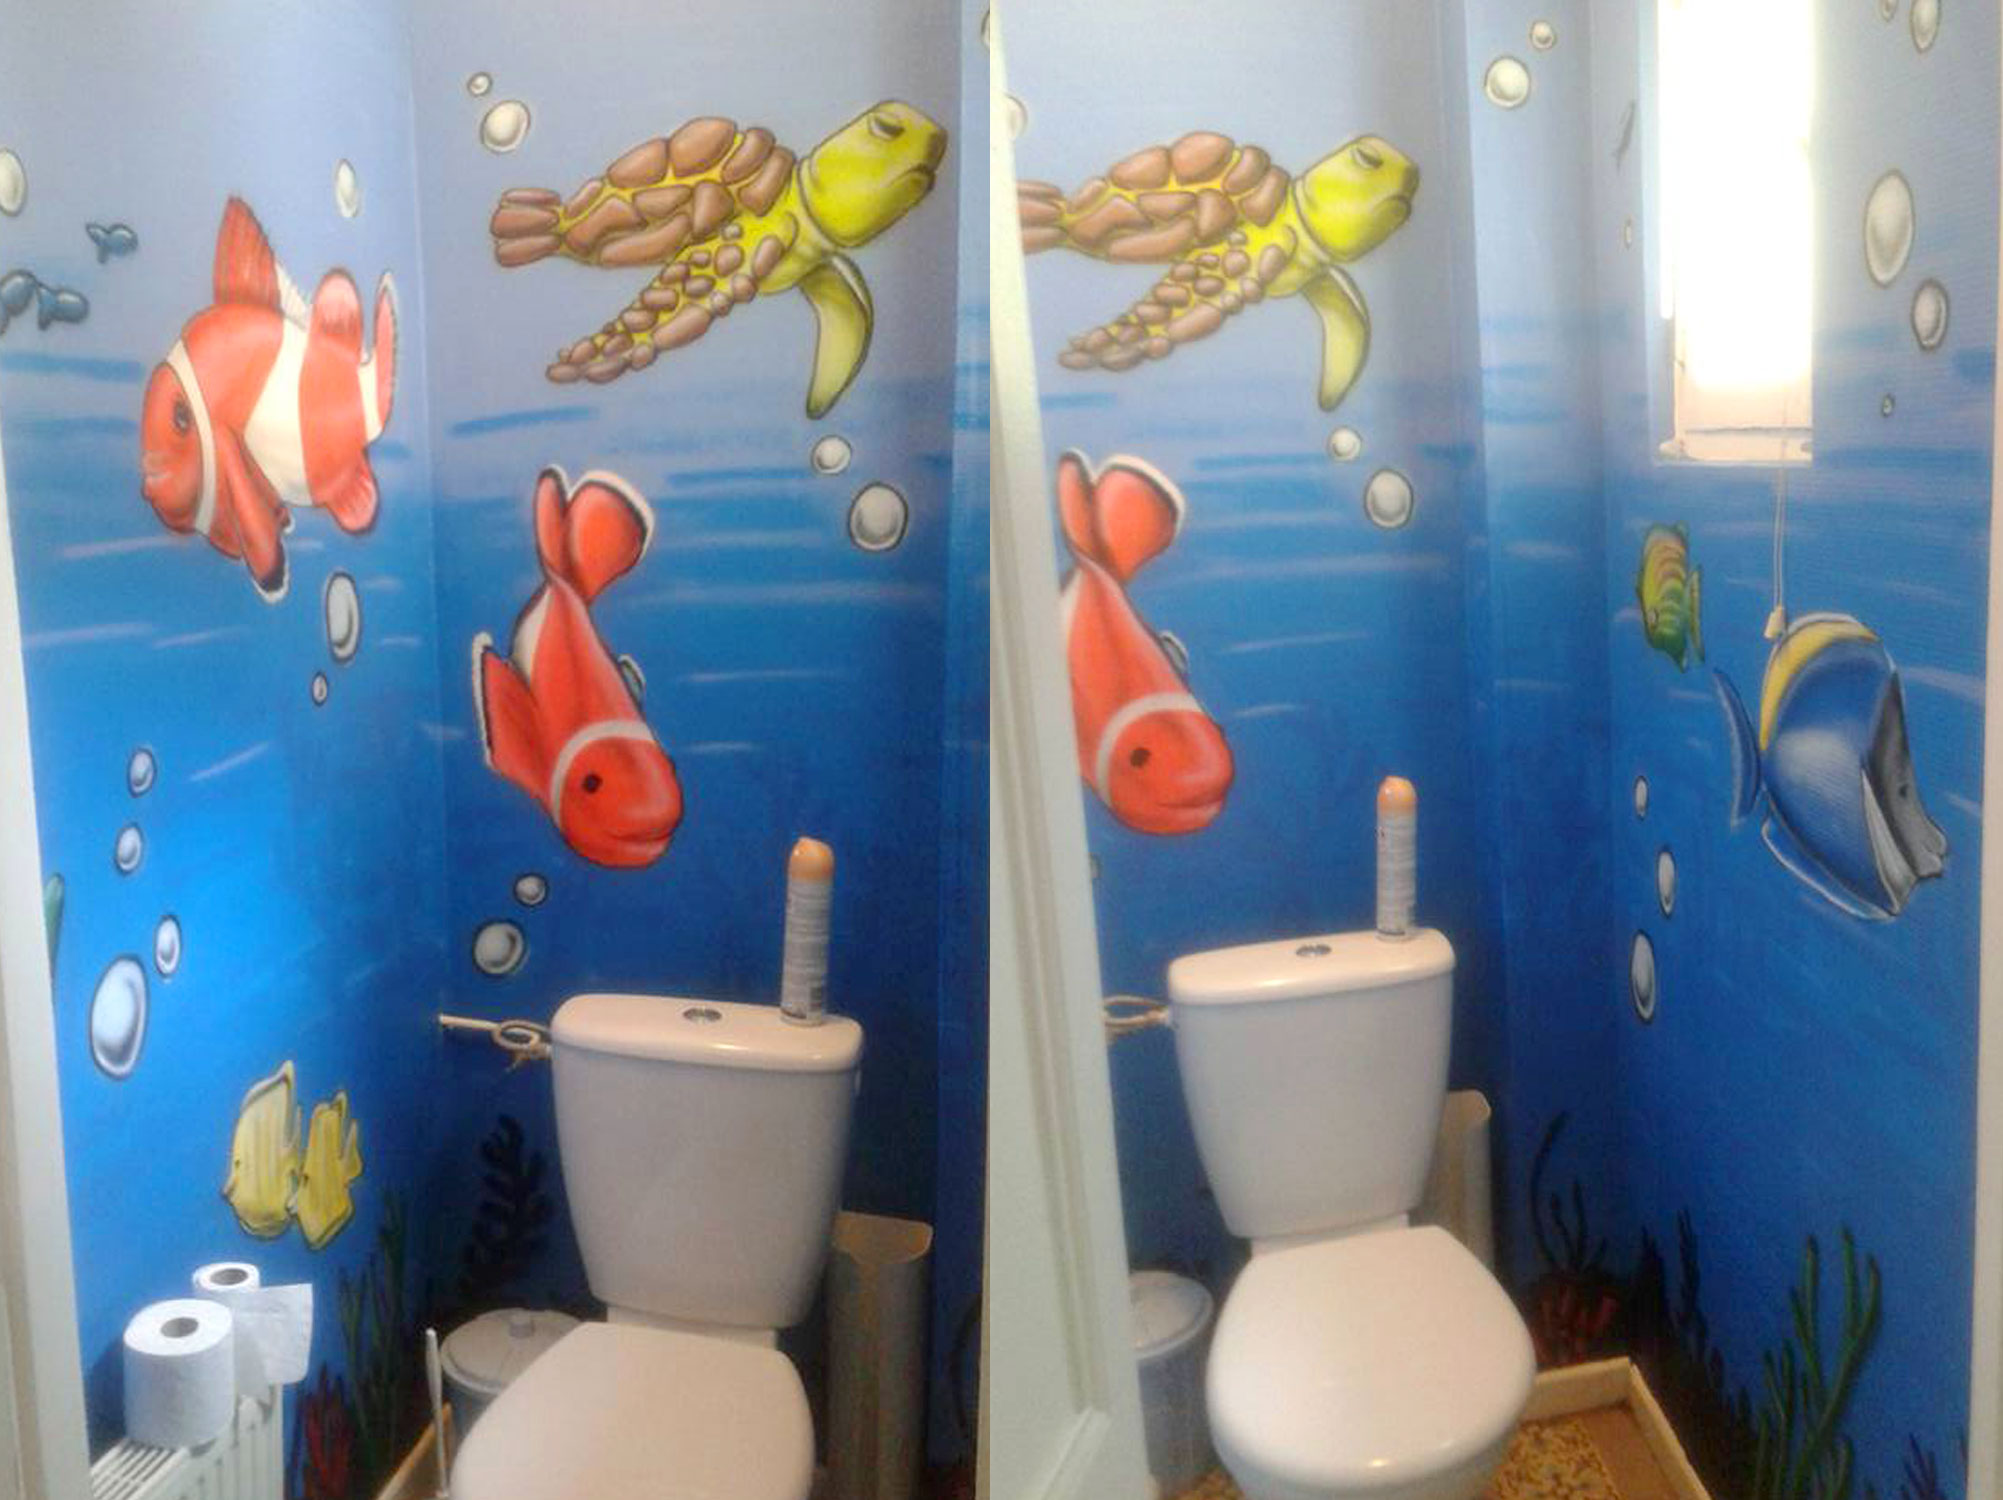 geograffeur-toilettes-poissons